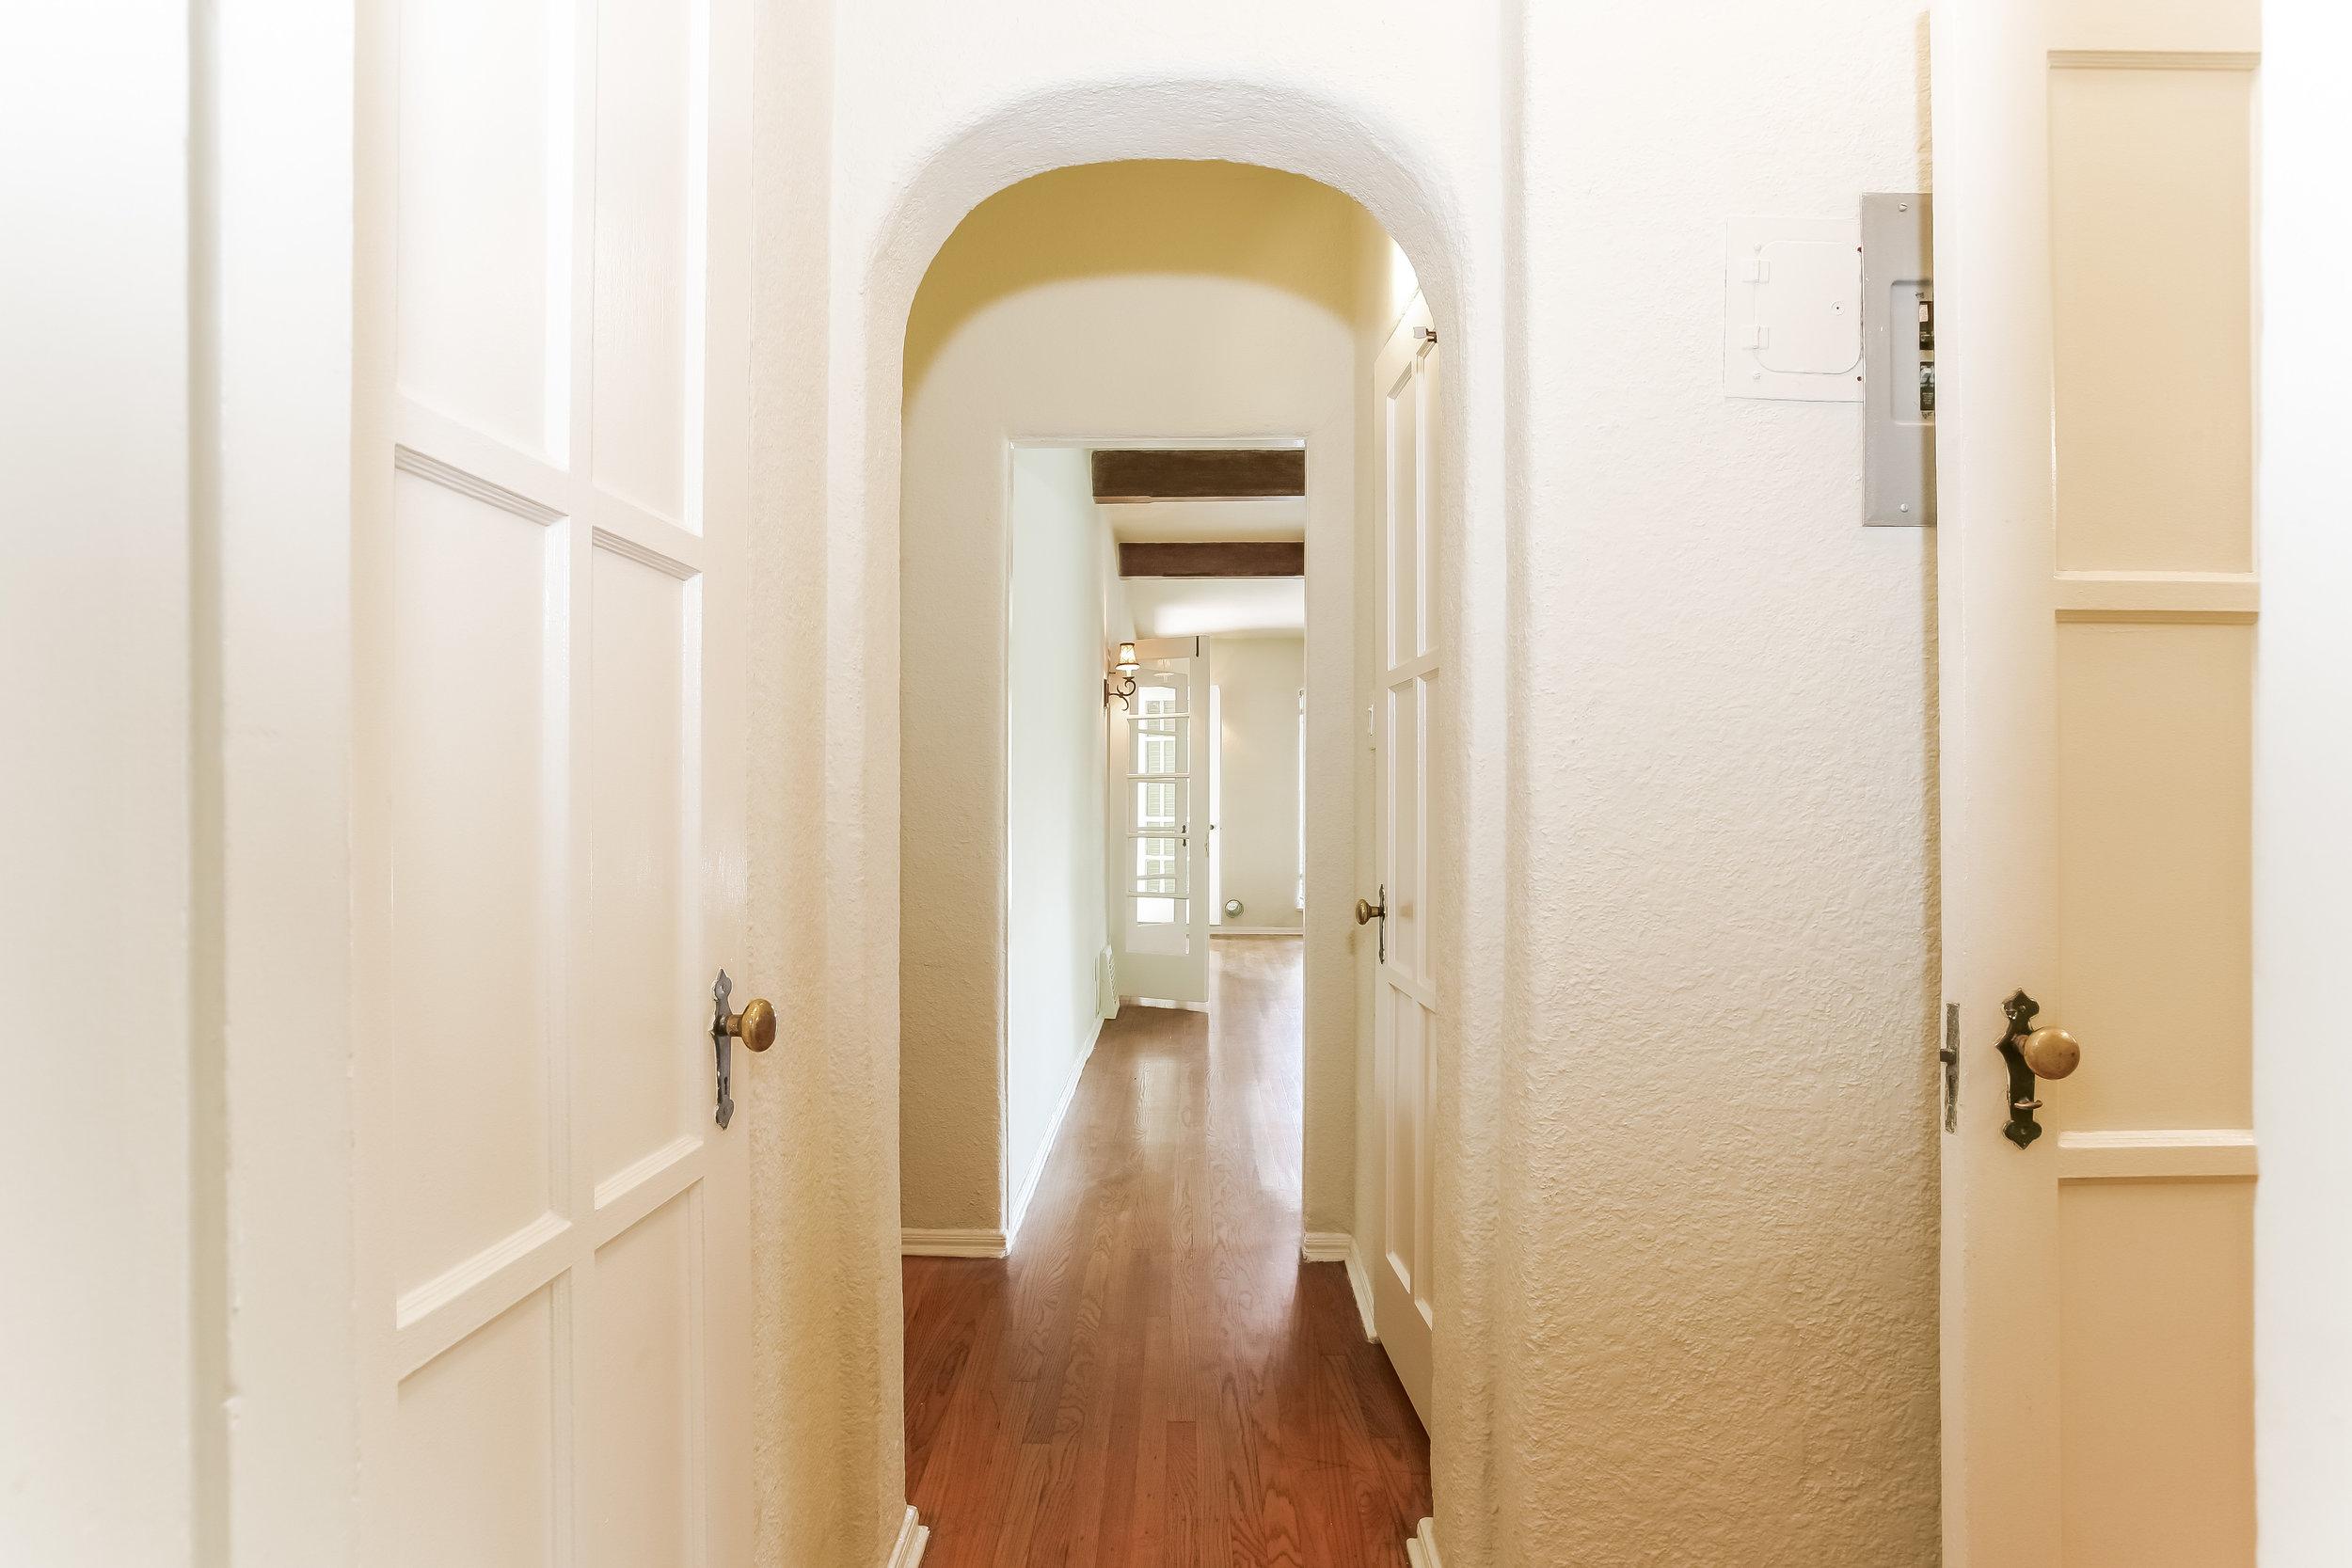 027-Hallway-1094554-print.jpg